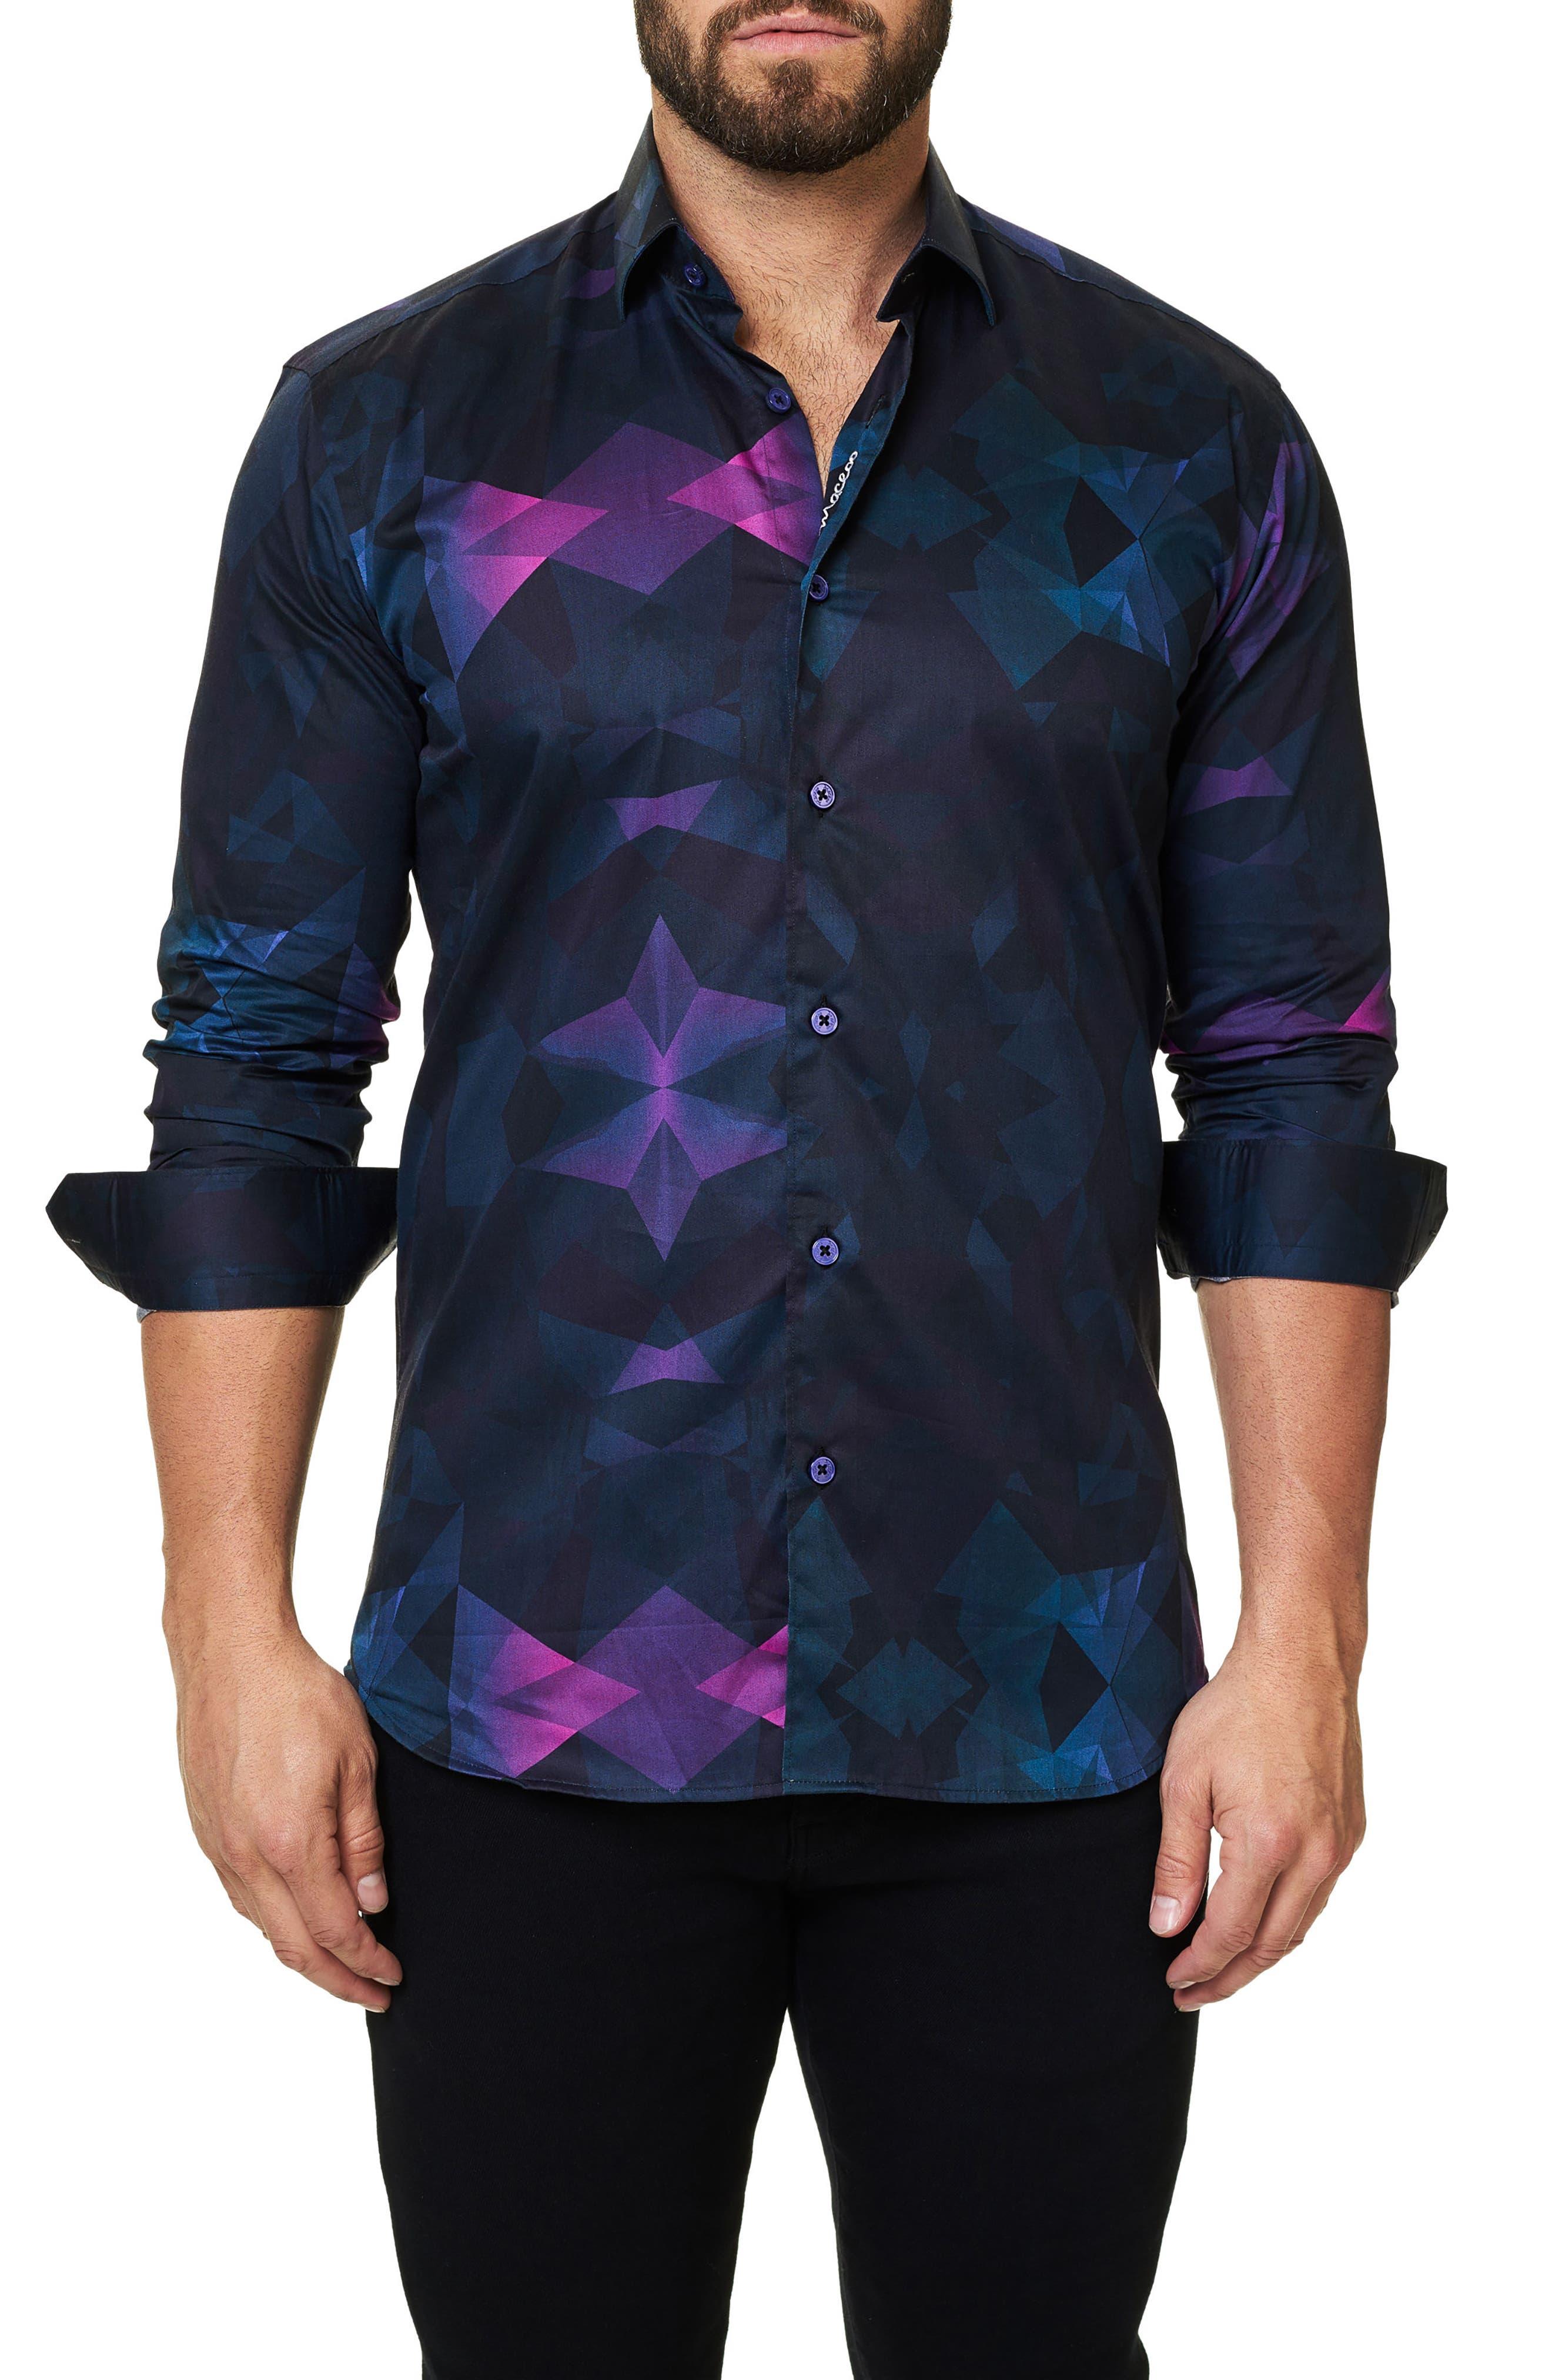 Maceoo Luxor Webspread Dimensional Trim Fit Sport Shirt